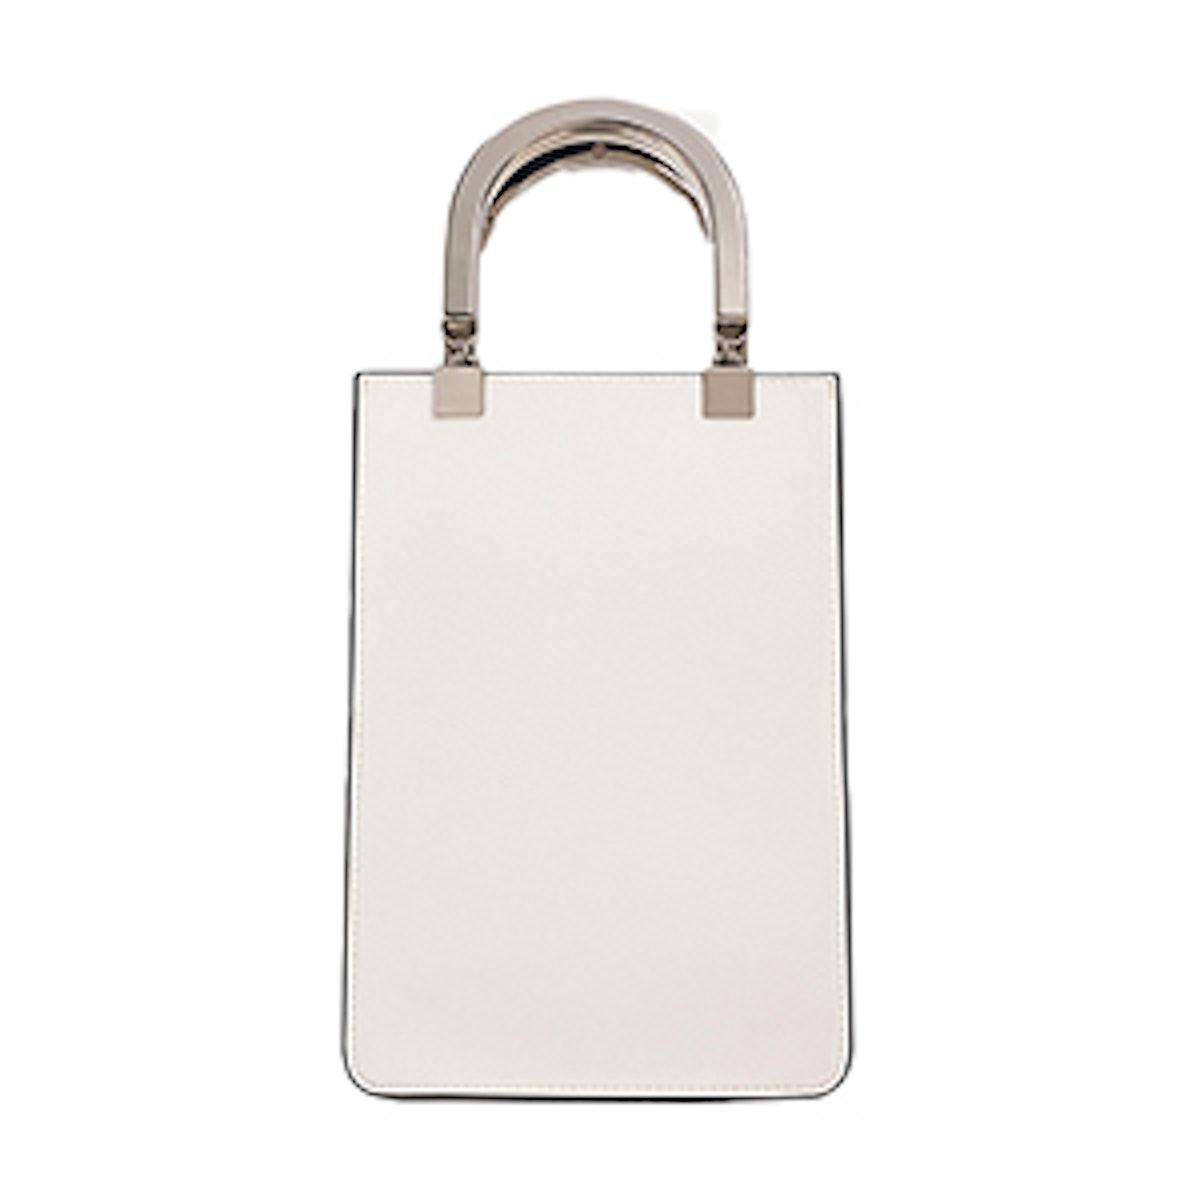 Mini Tote Bag With Metallic Handles